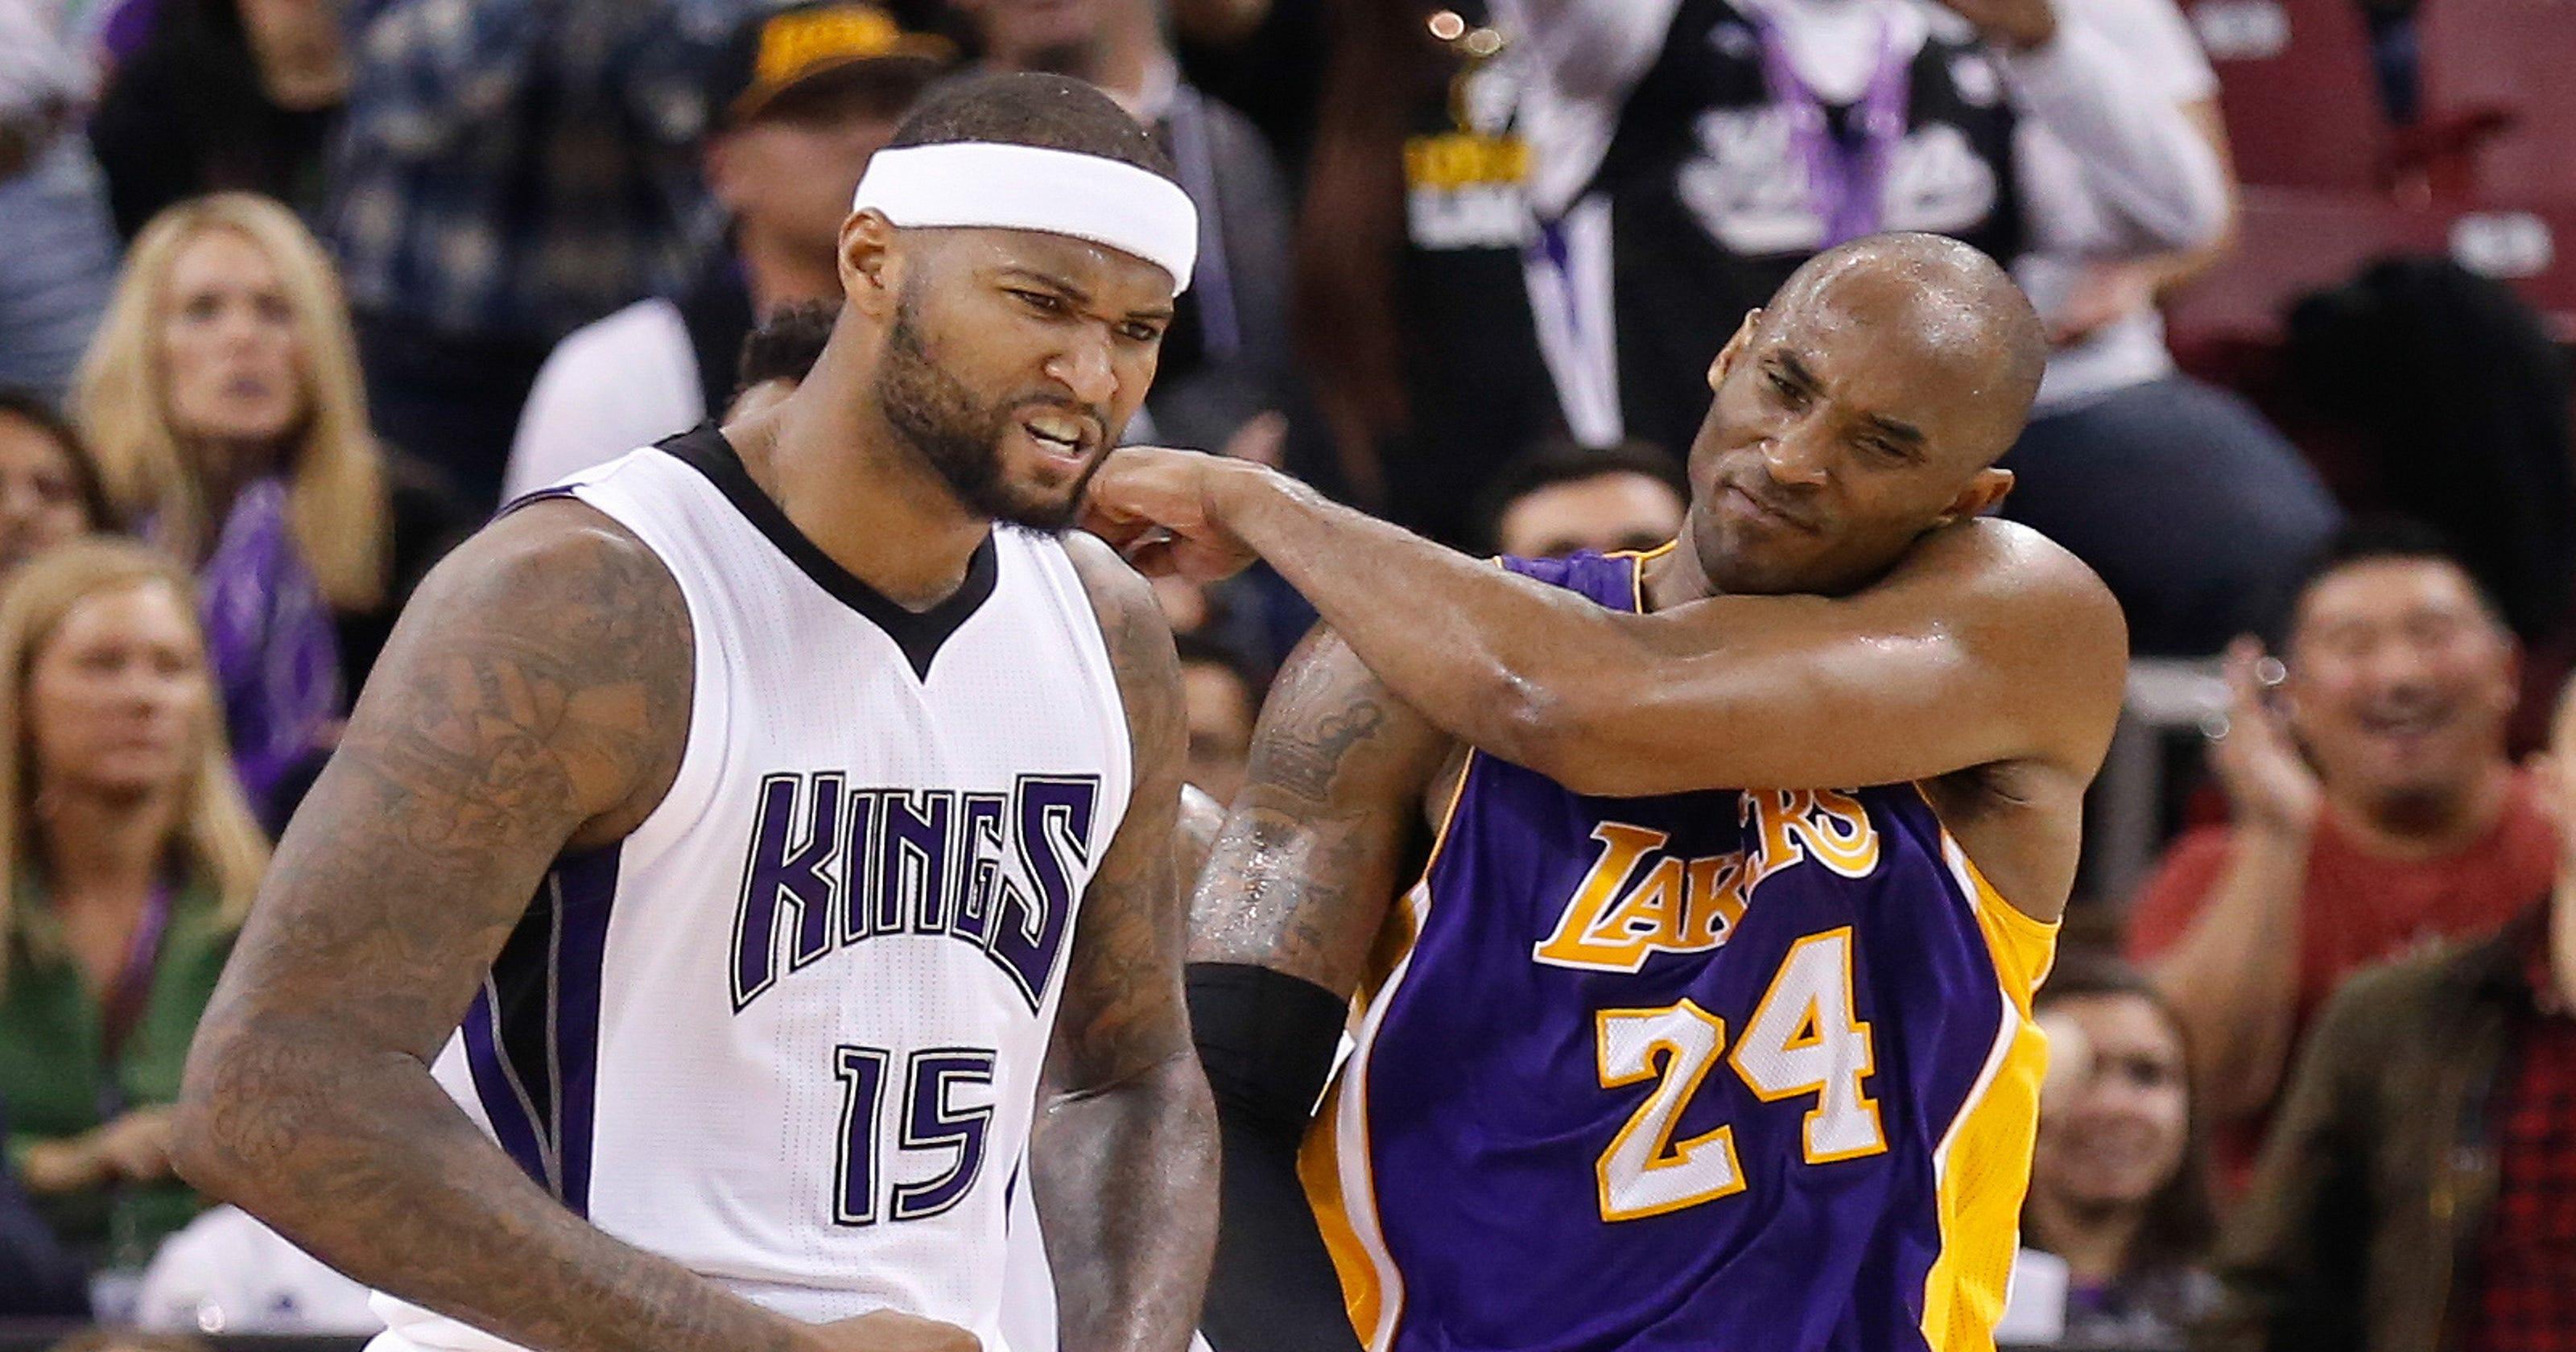 98a70604d99 Kings drop Lakers to snap five-game losing streak